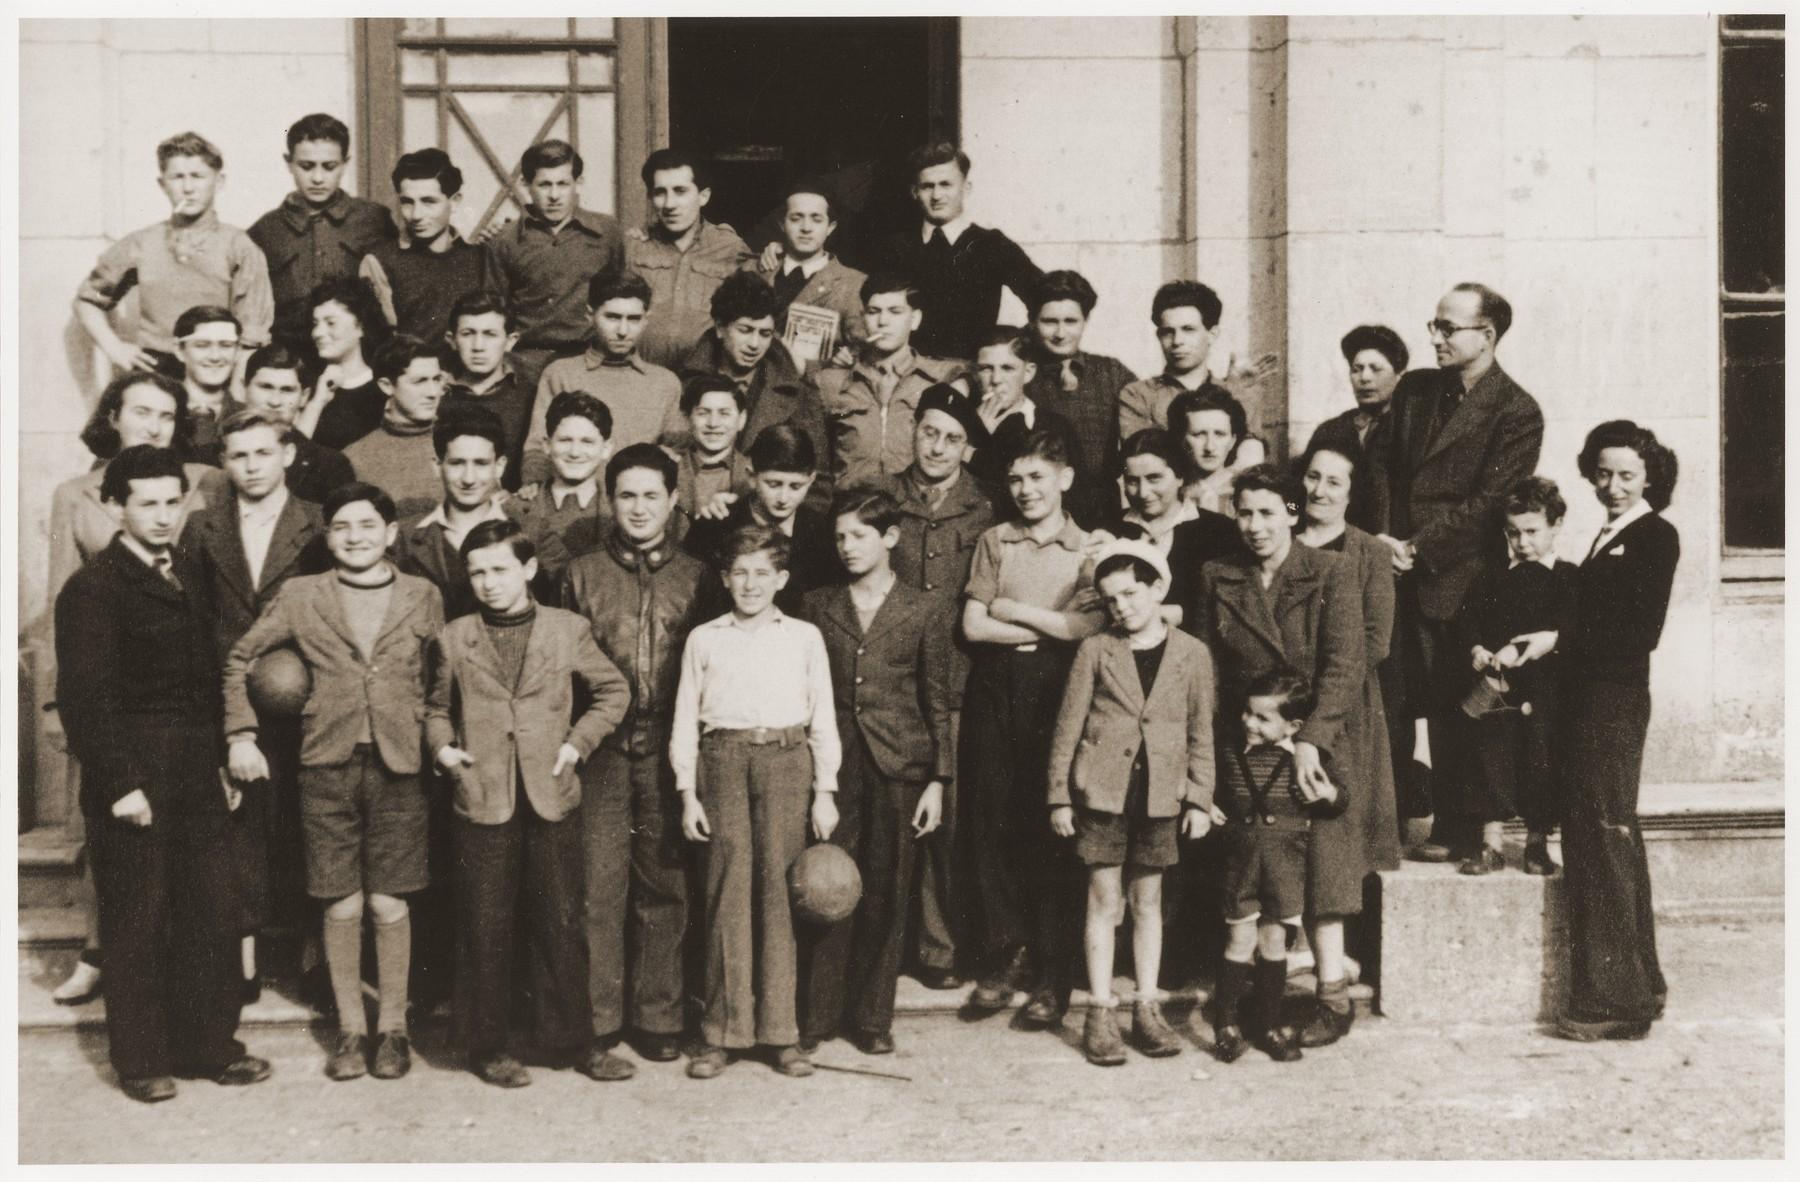 Group portrait of Jewish DP youth and staff at the OSE (Oeuvre de Secours aux Enfants) children's home in Ecouis.  Among those pictured are Nachum Ajzenberg, Elias Balter, Henri Dymant, Andre Dymant, Wolf Fojgel, Gerszon Gerson, Lejzor Grunberg, Max Kozuch, Nachman Klugmann, Léon Lewkowitz, Téodor Lowy, Beniek Mrcwka, Manfred Reingewitz, Salek Sandowski, Abram Schilcott,  Ignac Spett, Romek Wajsman, Lolek Weinstein.  [See enclosed sheet for precise identification.]